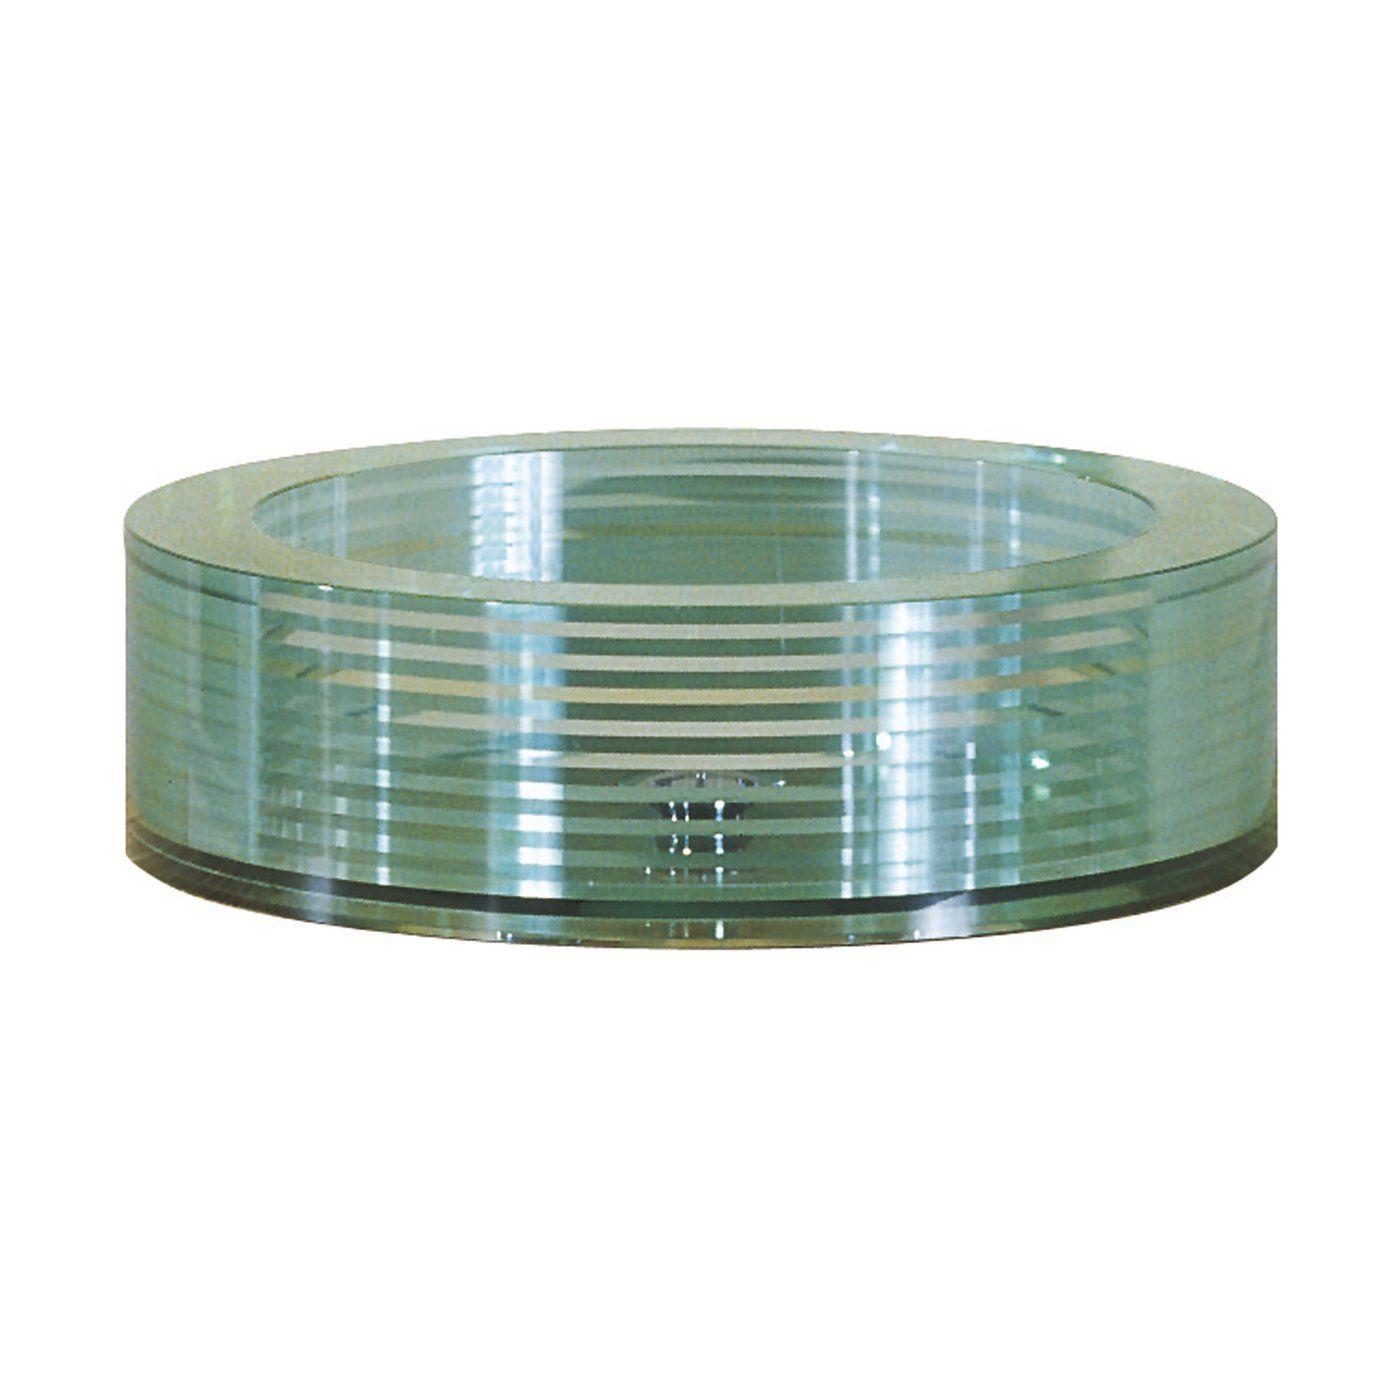 Bathroom Sinks Lowes Canada avanity gve450rd round tempered segmented glass vessel sink